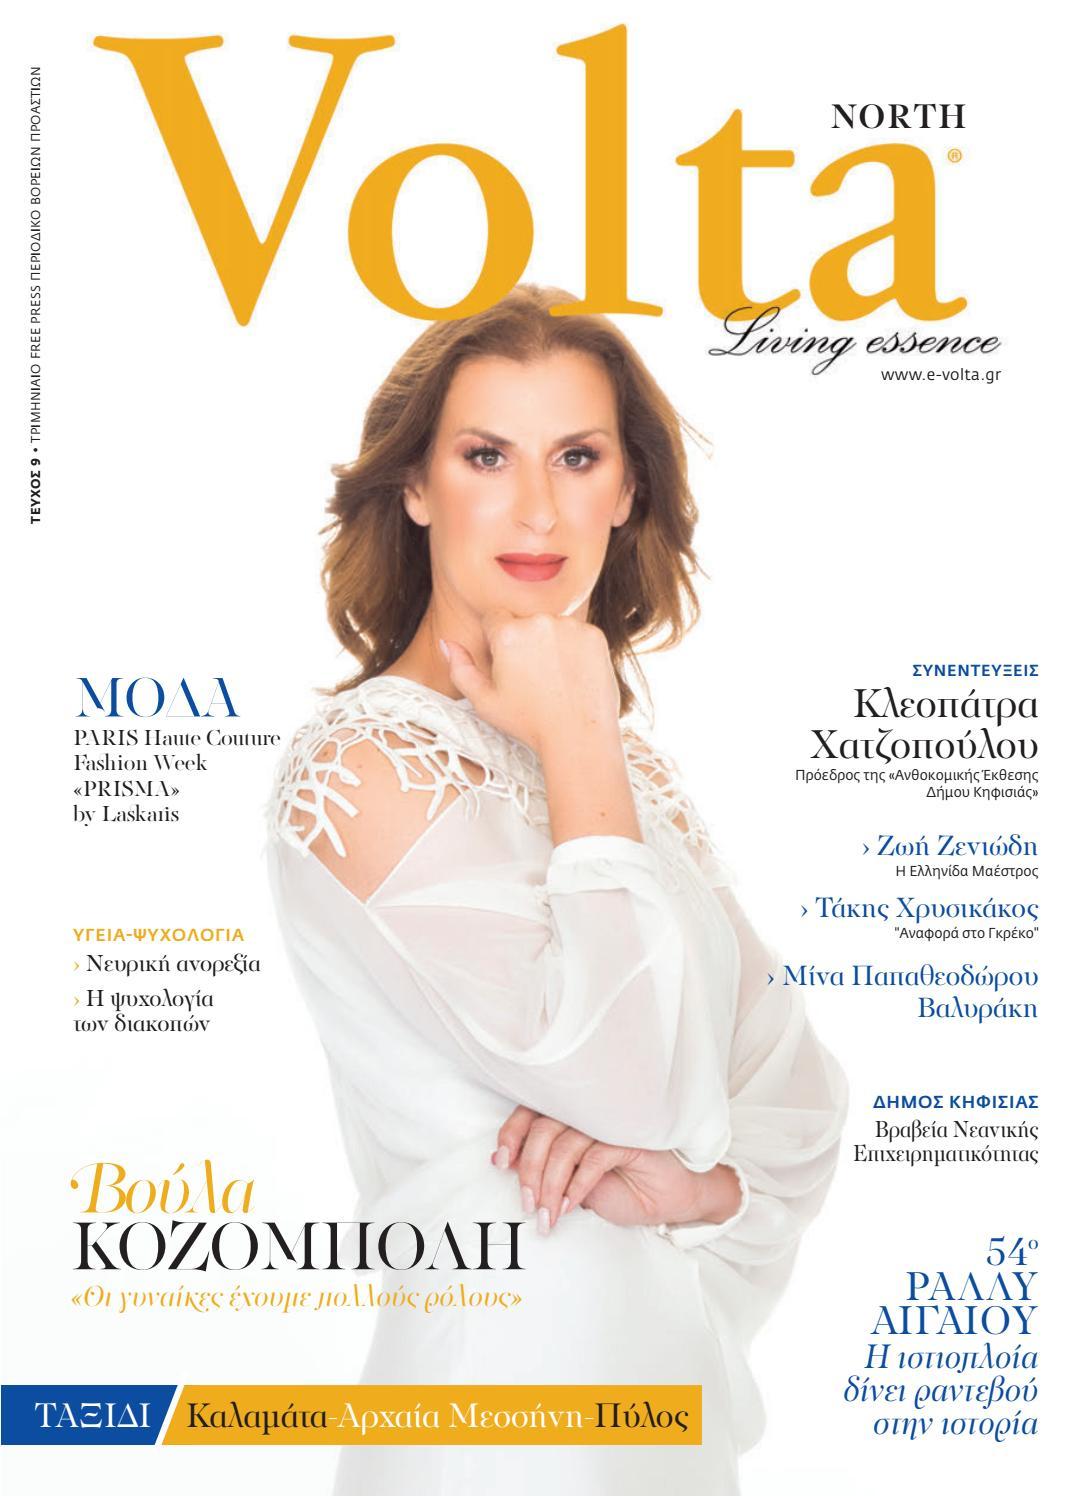 593c0f86d4 VOLTA North  09 by Volta Free Press Magazine - issuu